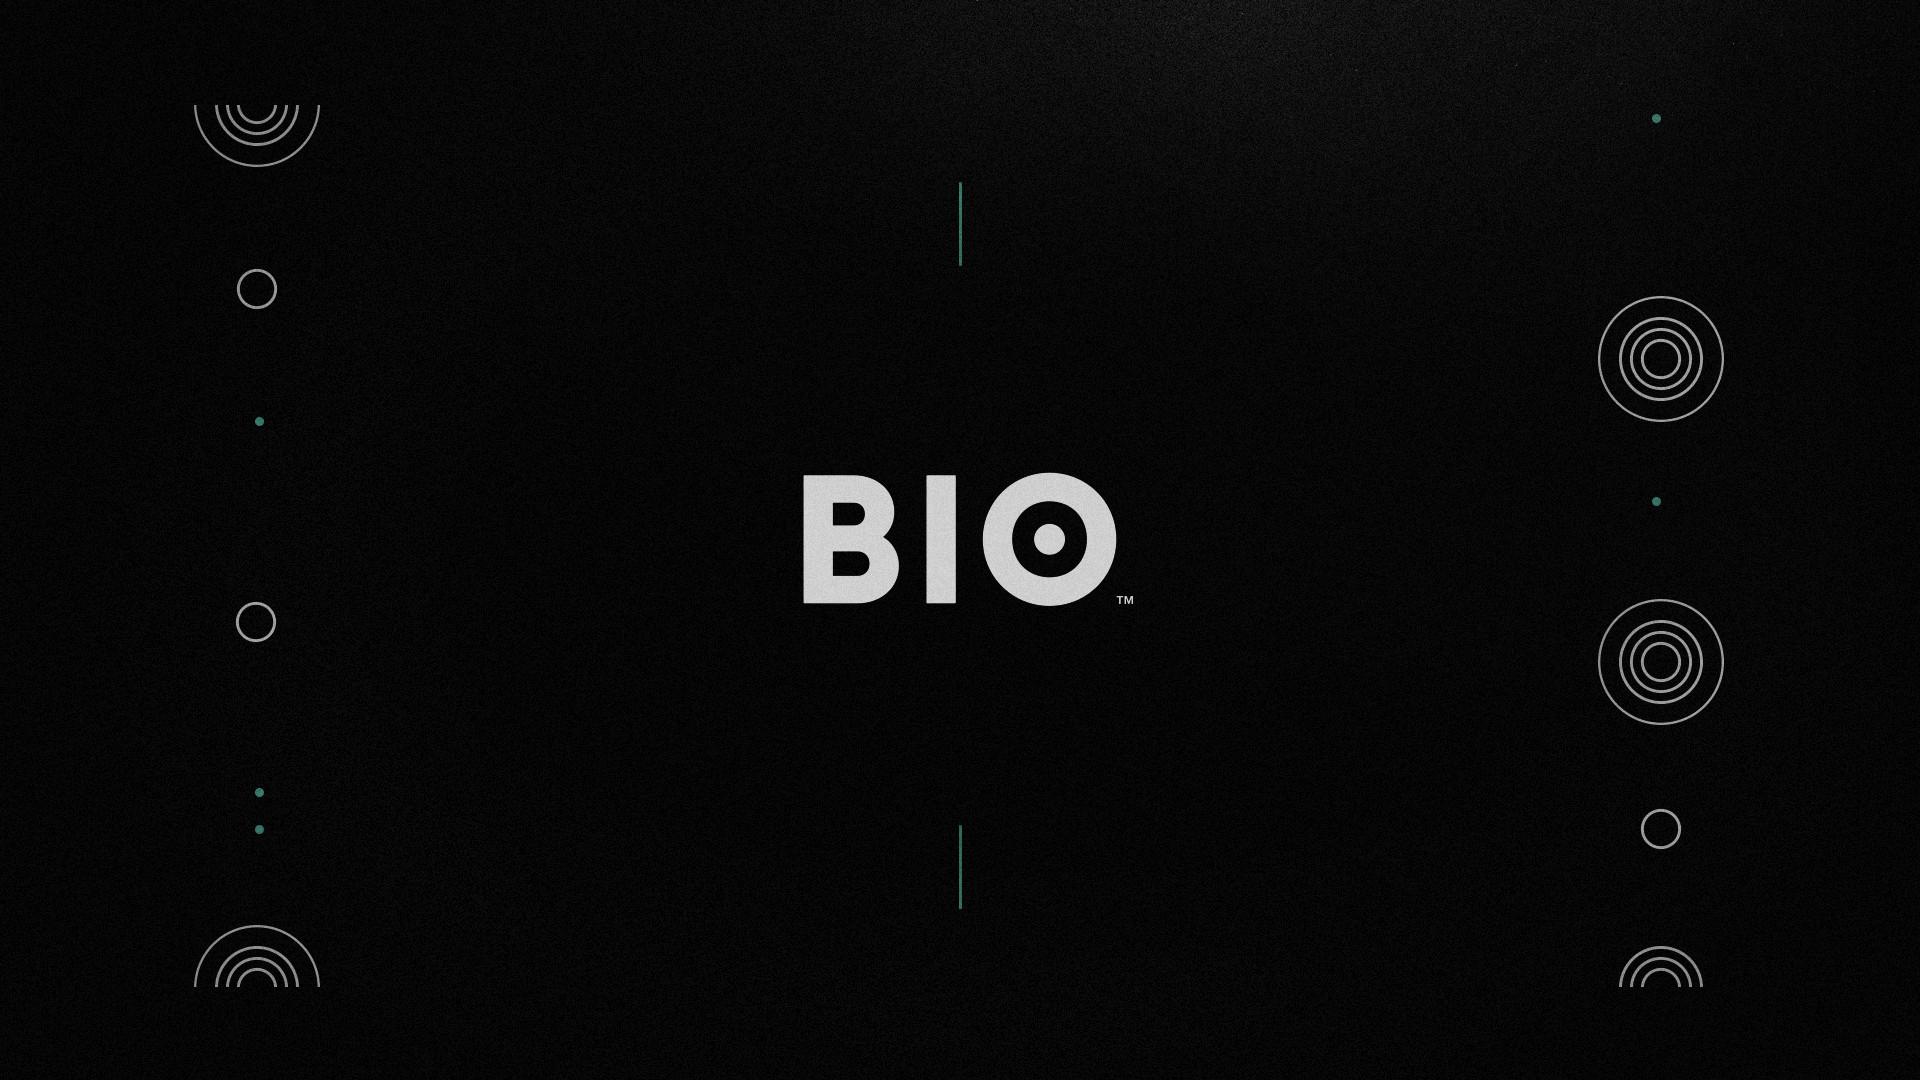 A+E_Upfront_Bio_01_titlecard.jpg